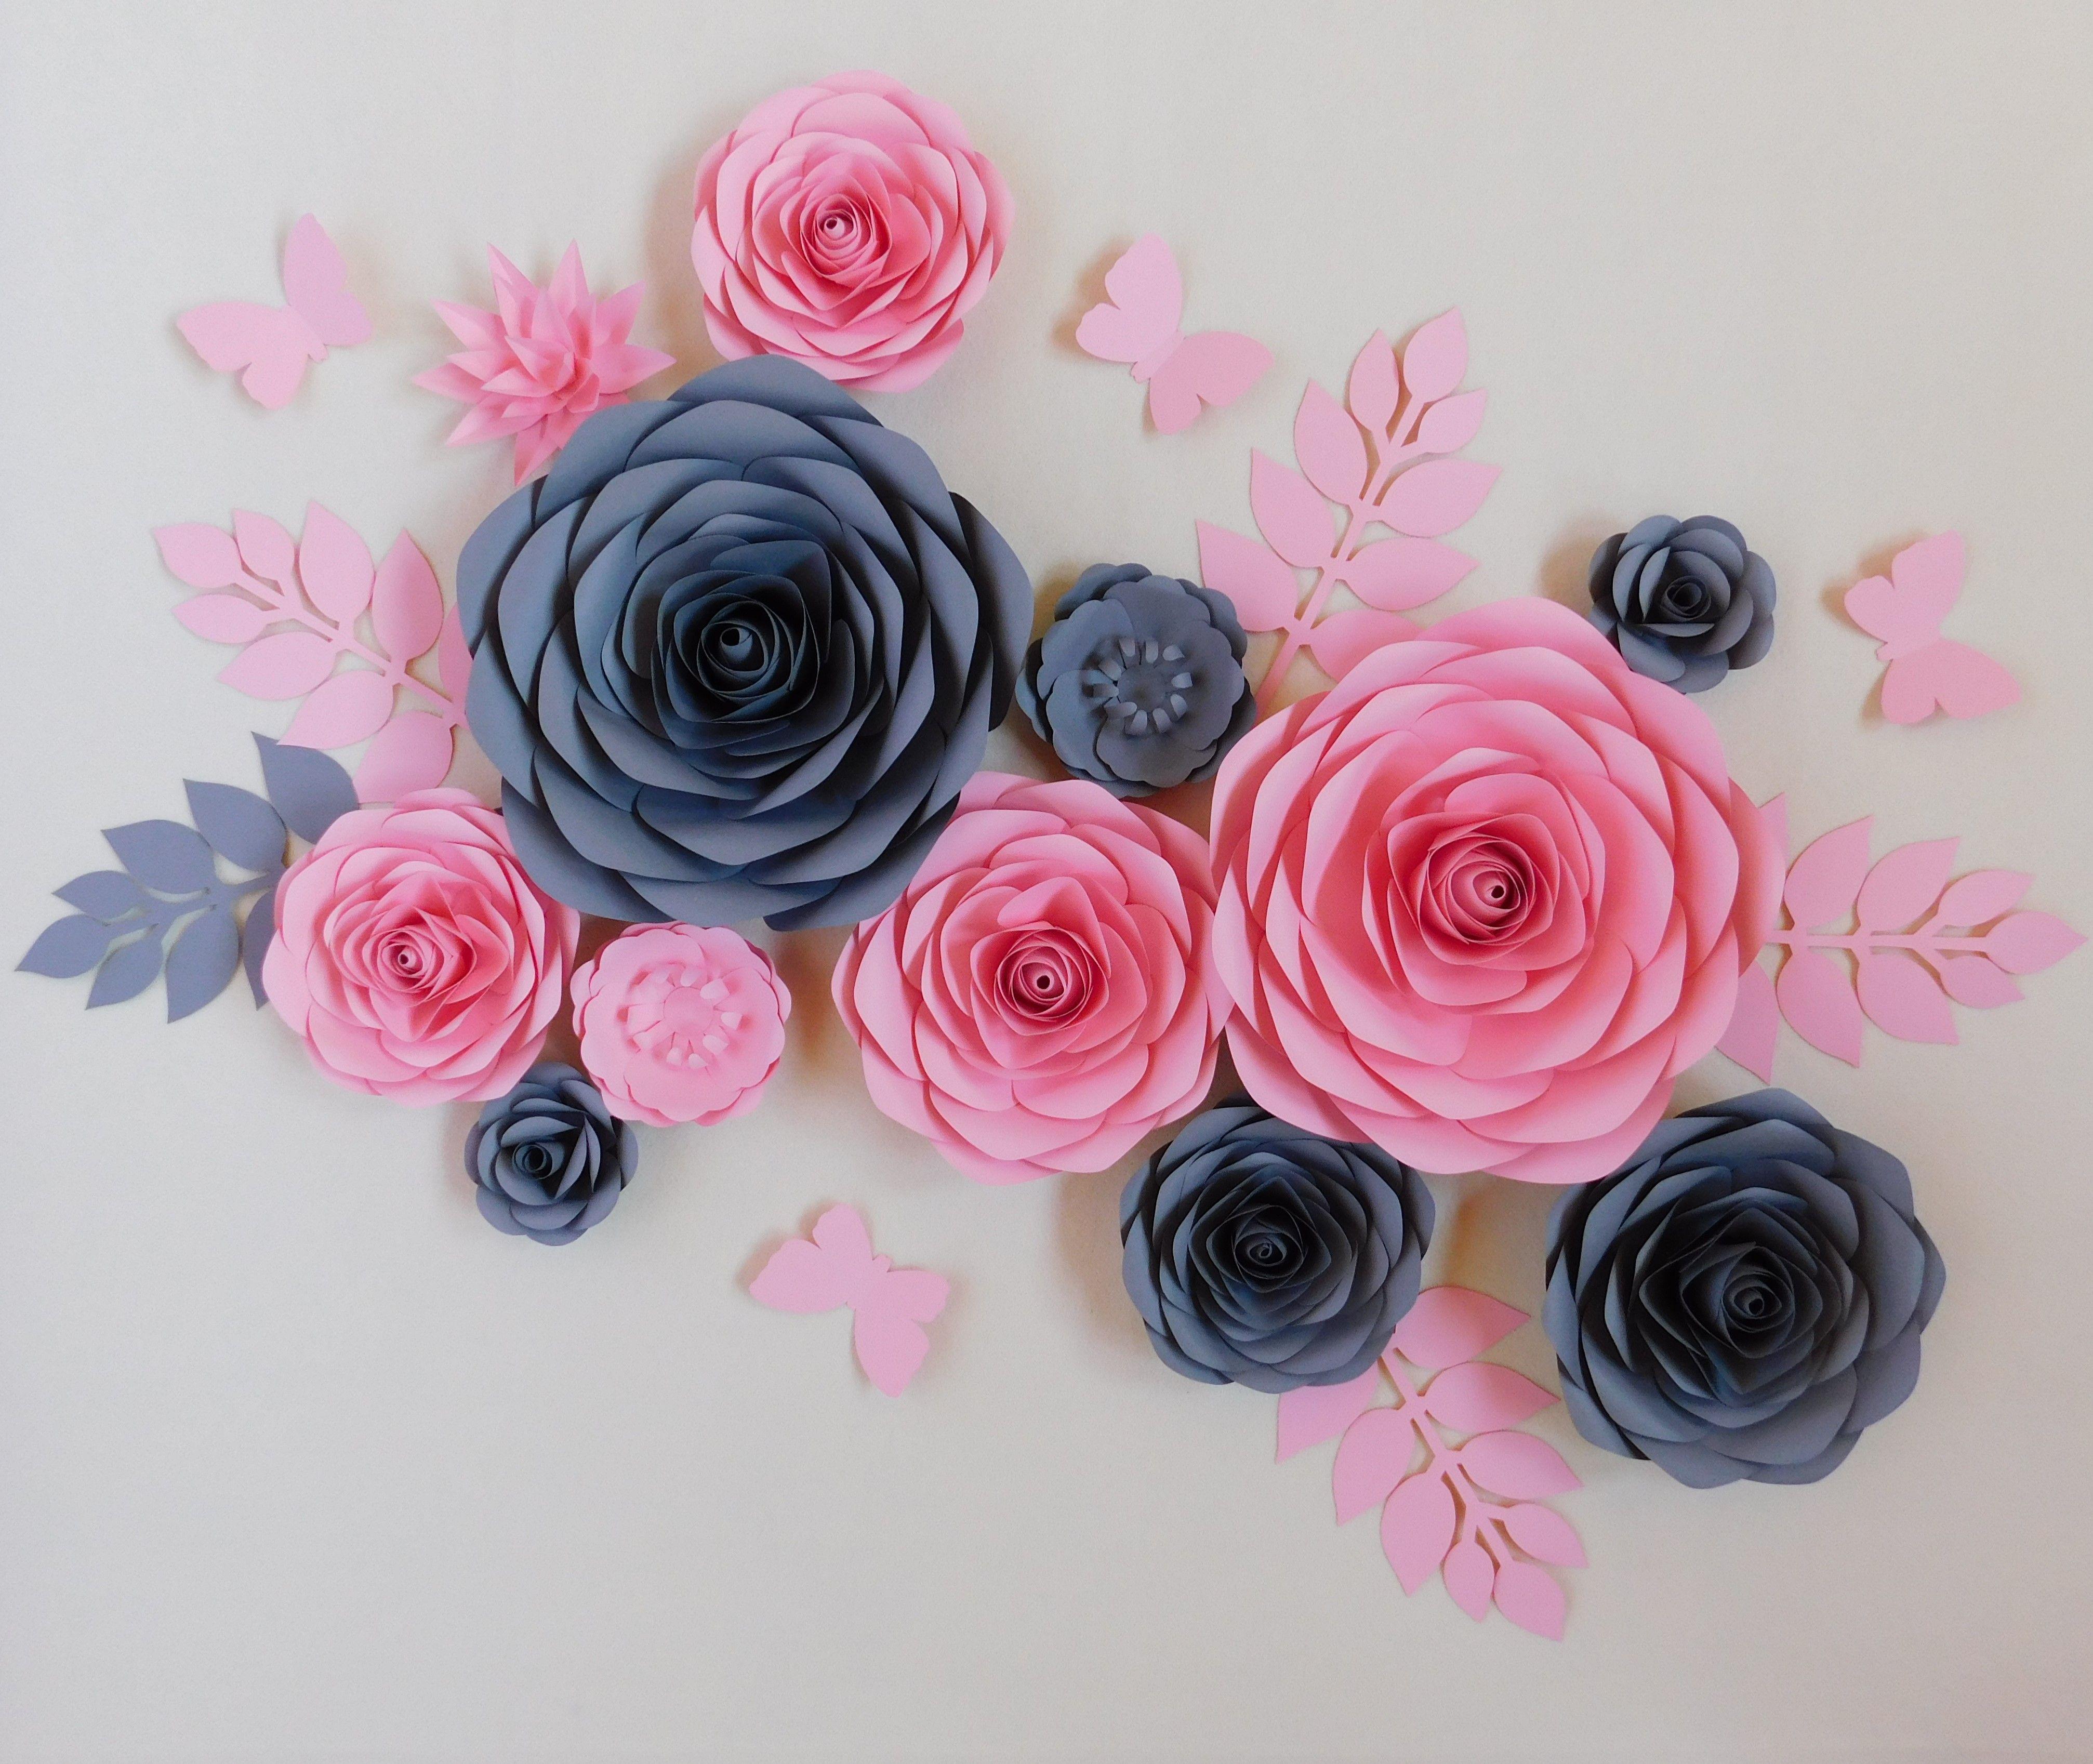 Kwiaty Z Papieru Paper Flowers Kwiaty Chanel Paper Flowers Flower Backdrop Flower Wall